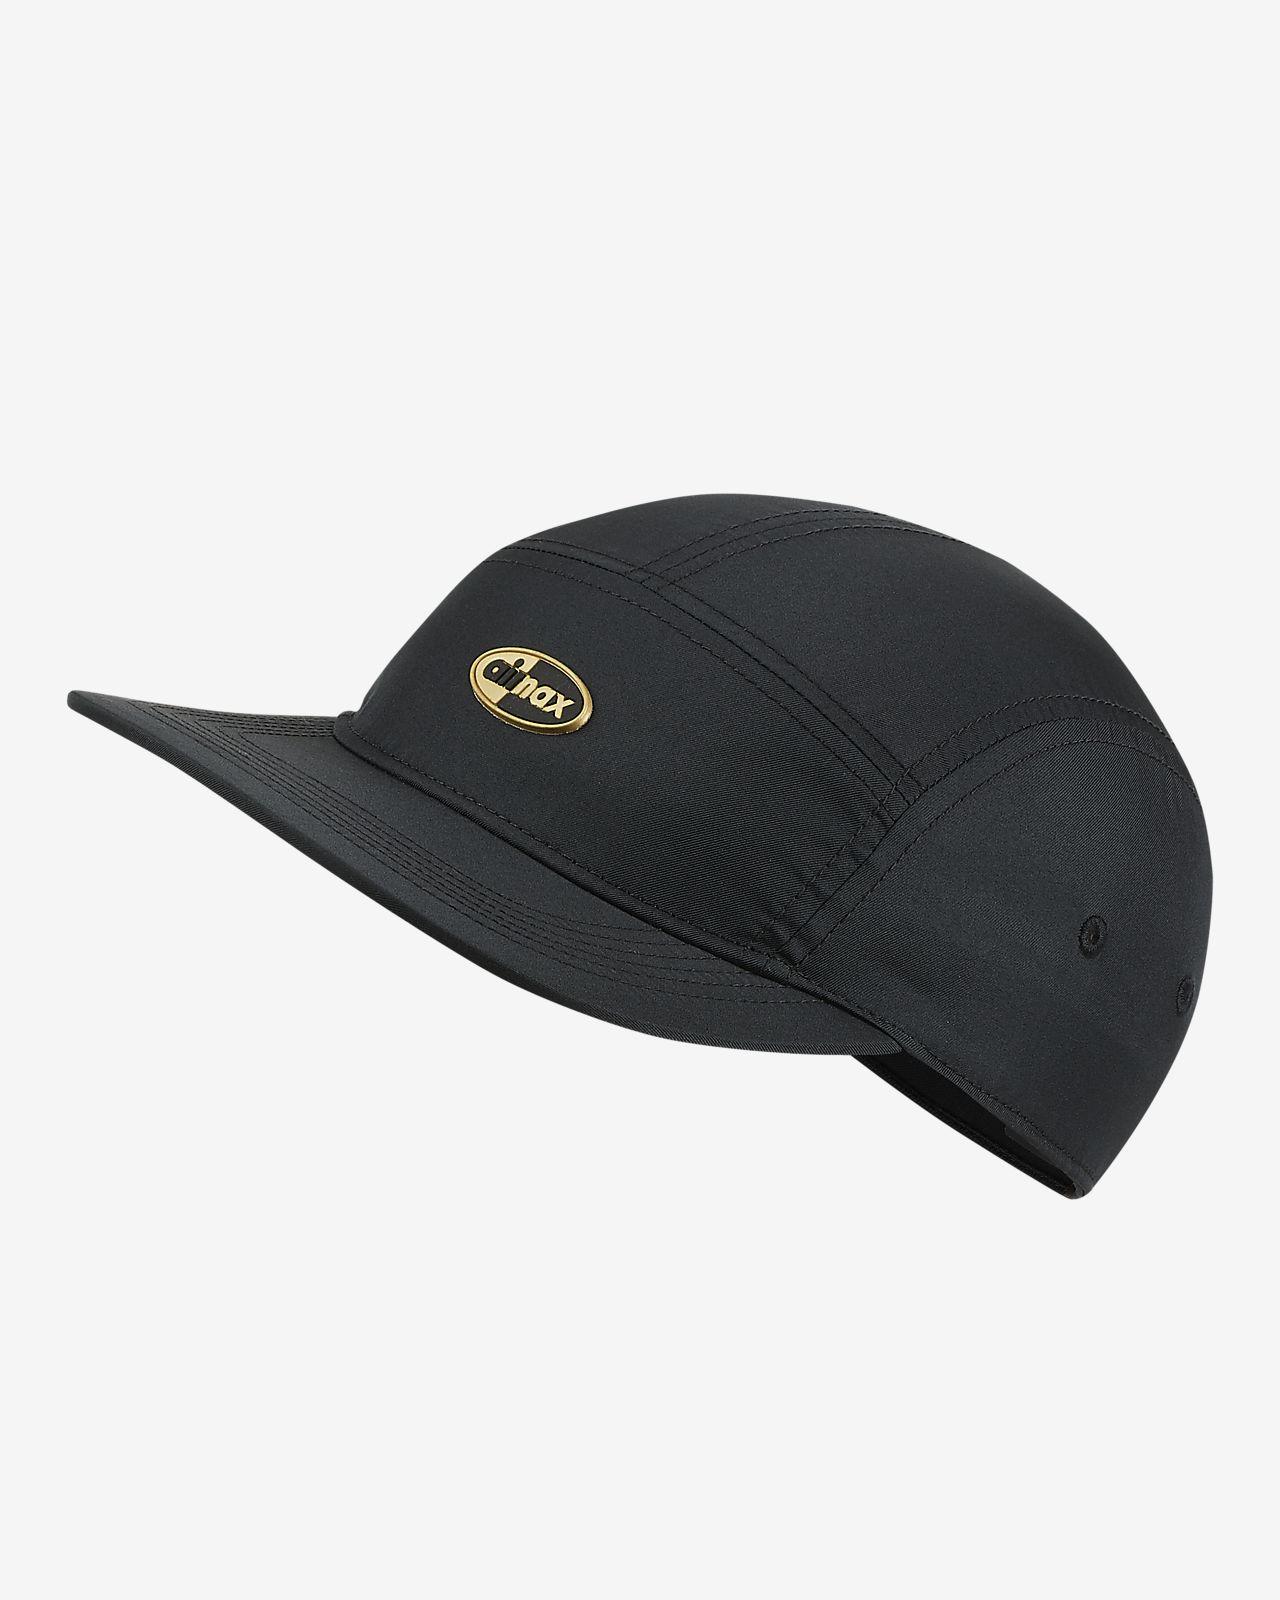 69eaac0b222 Nike Sportswear AW84 Adjustable Hat. Nike.com